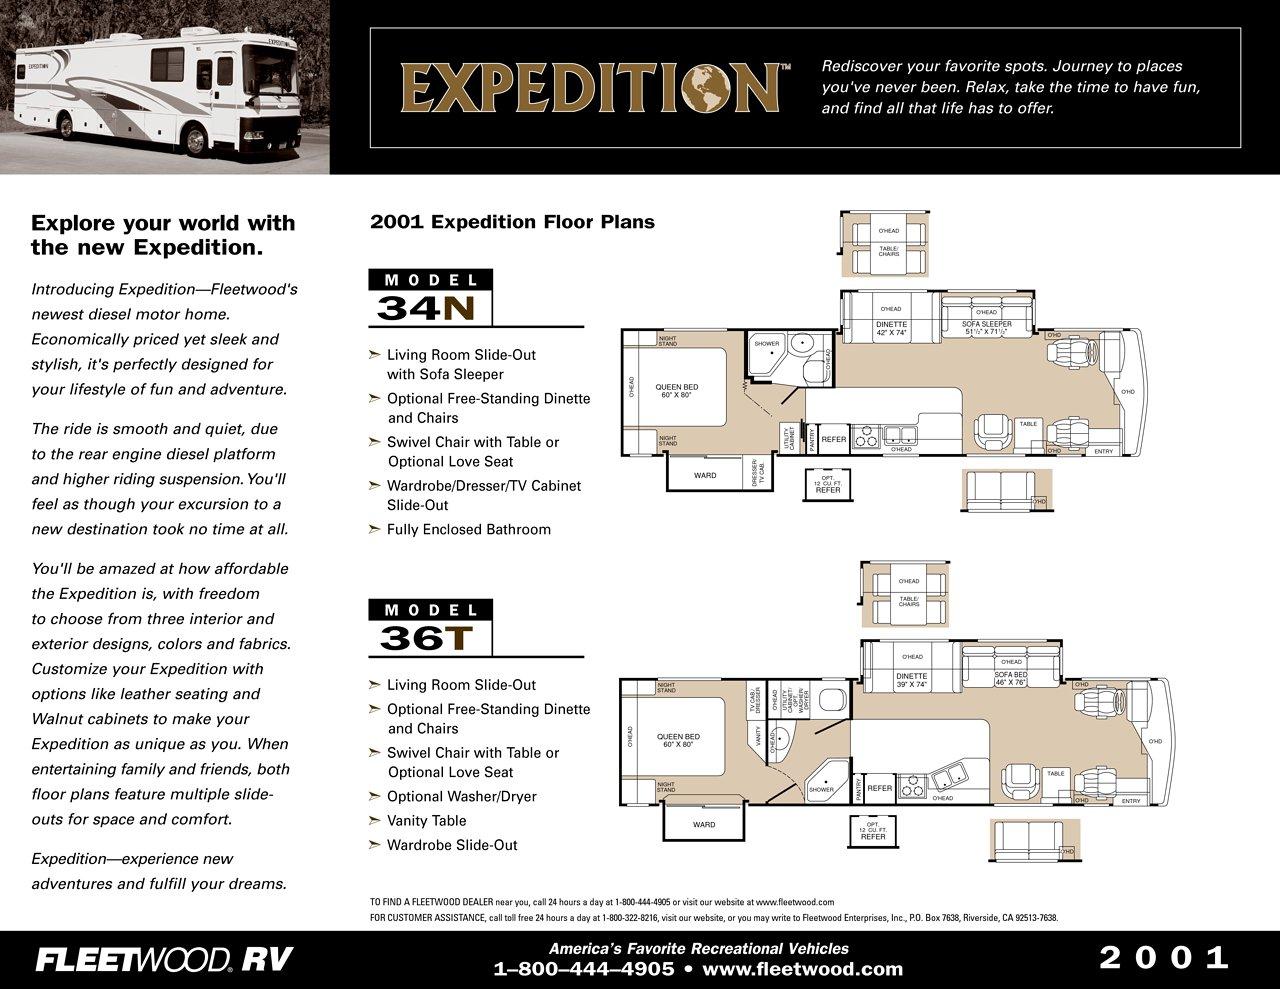 2000 fleetwood rv floor plans for Kentucky dream homes floor plans